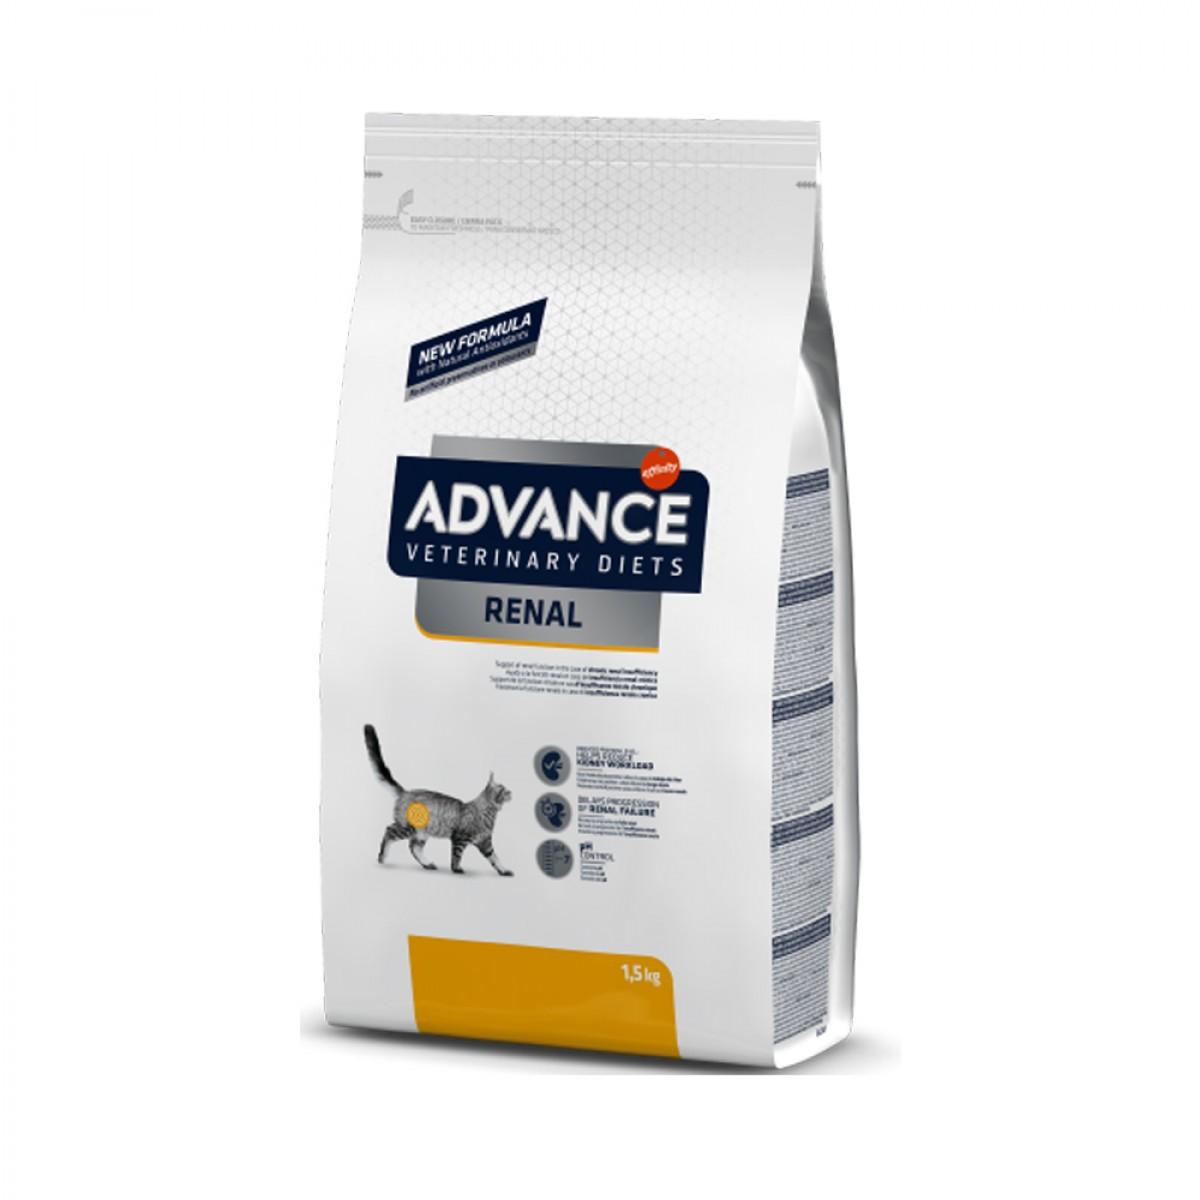 Hrana pentru pisici cu insuficienta renala - Advance Renal Cat 1.5 Kg